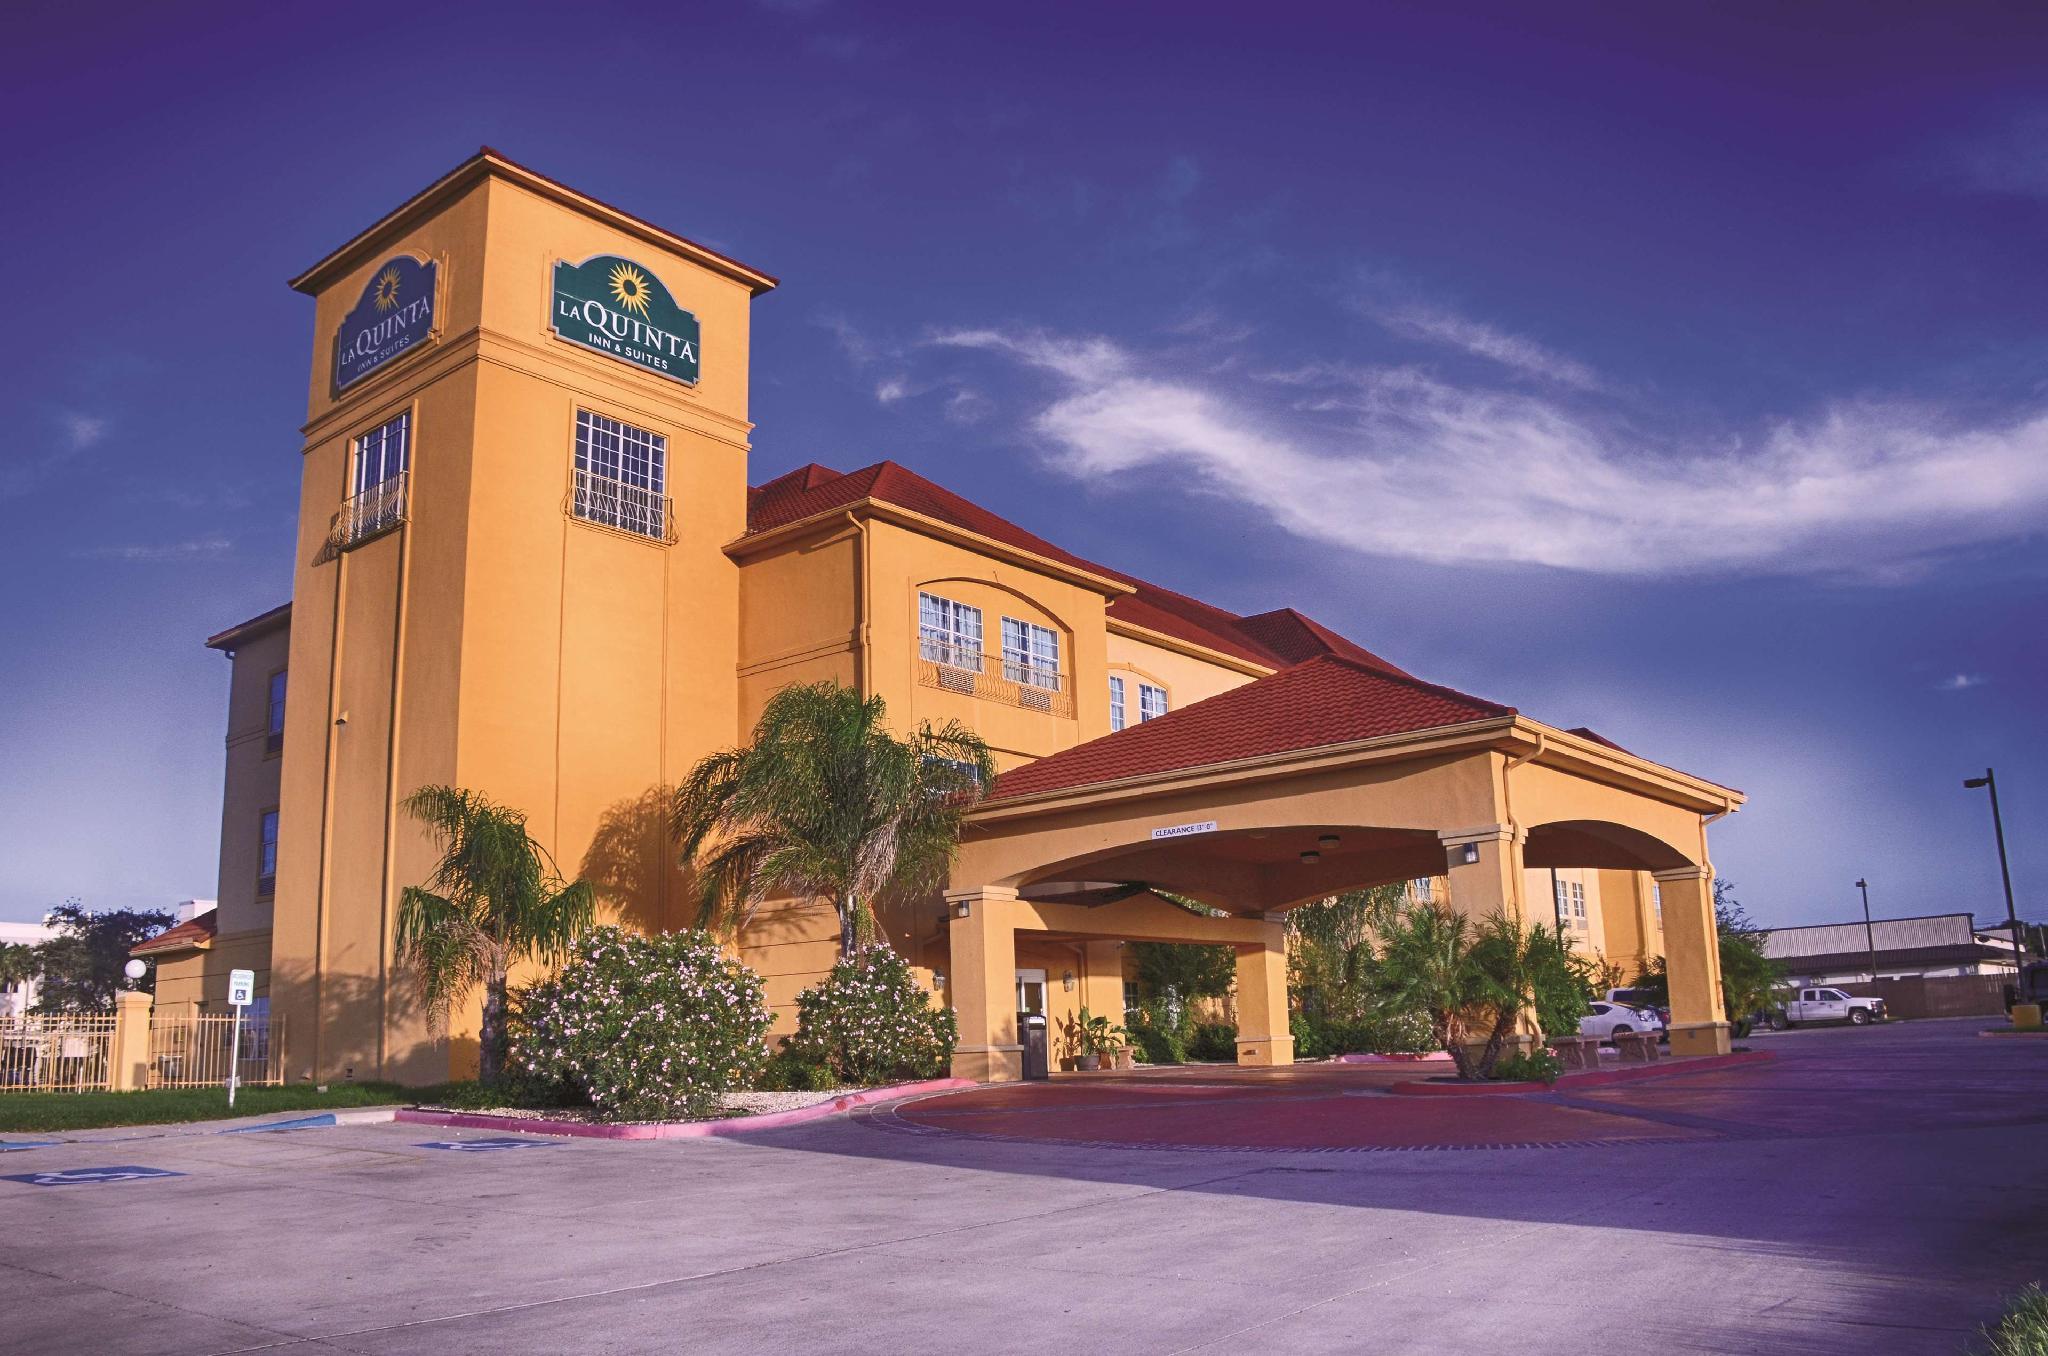 La Quinta Inn And Suites By Wyndham Alice